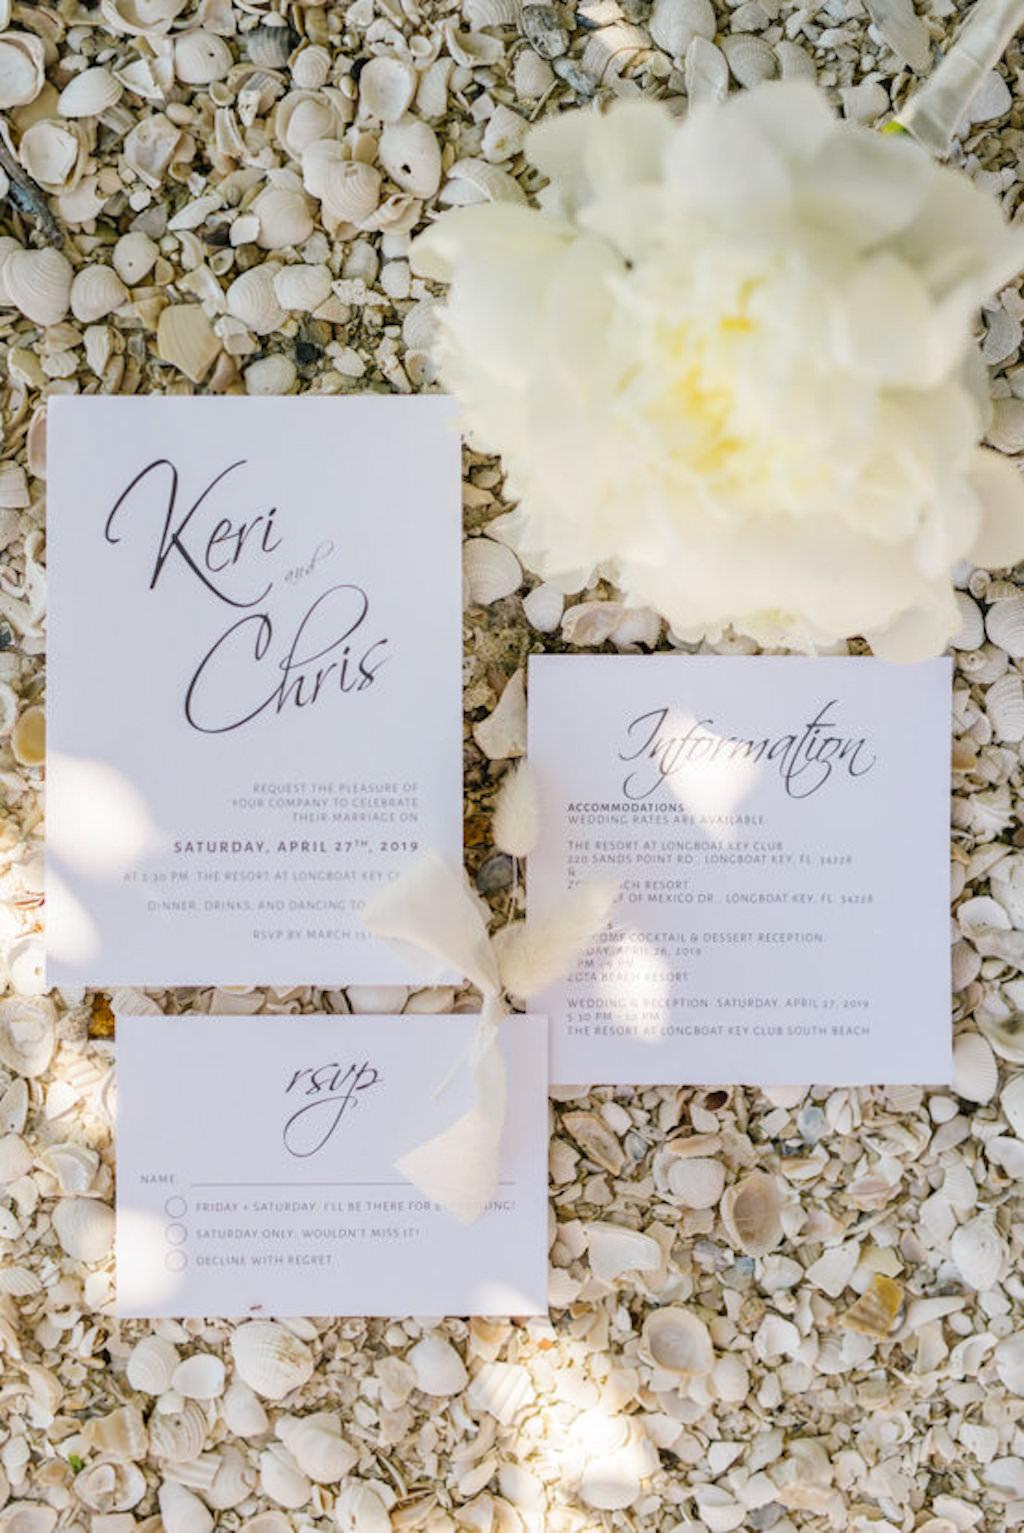 White Invitation Suite with Black Script Design with Seashells Portrait